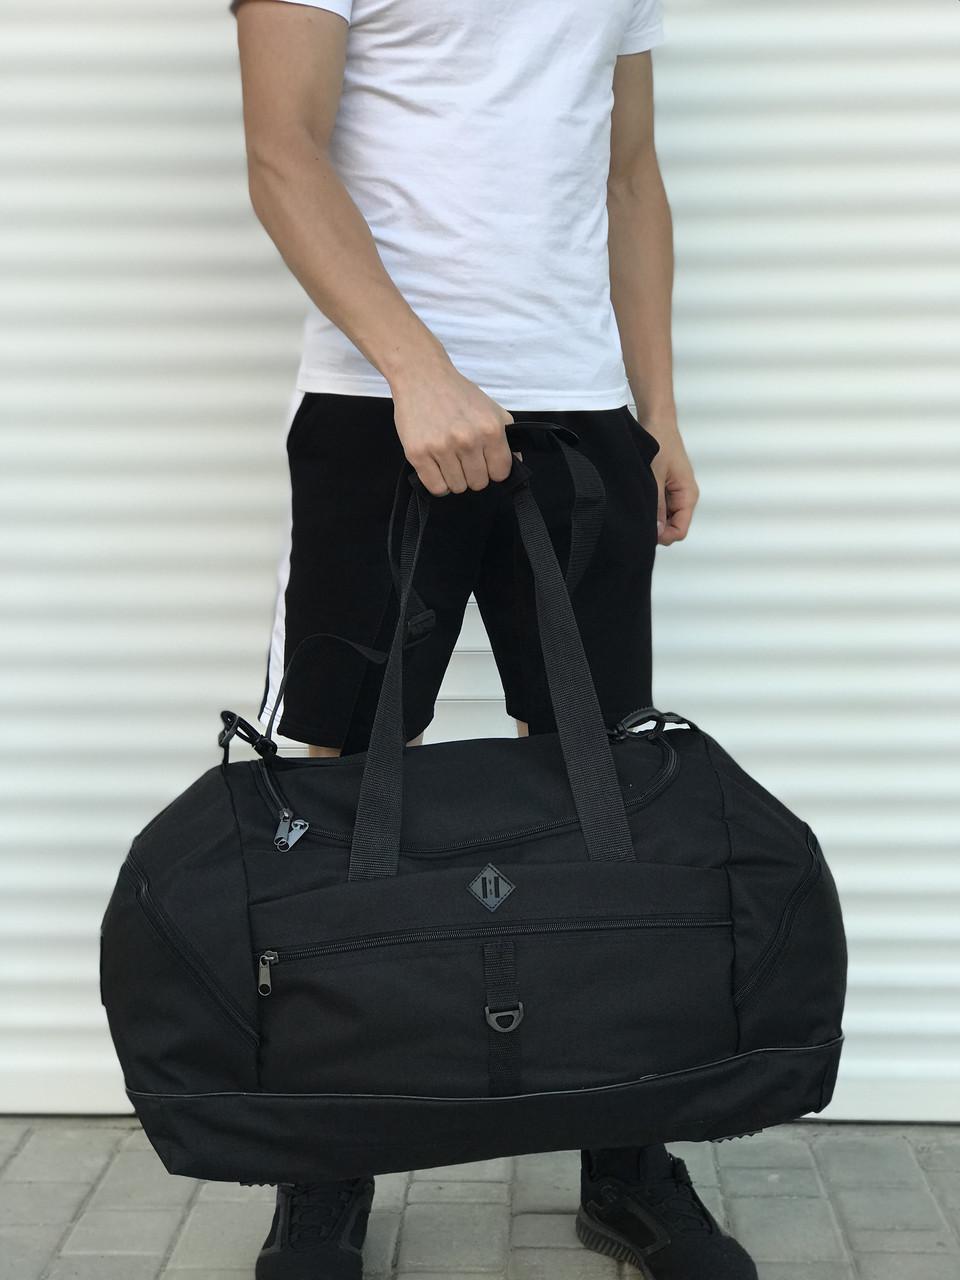 Велика дорожня сумка, чорна (60 л.)